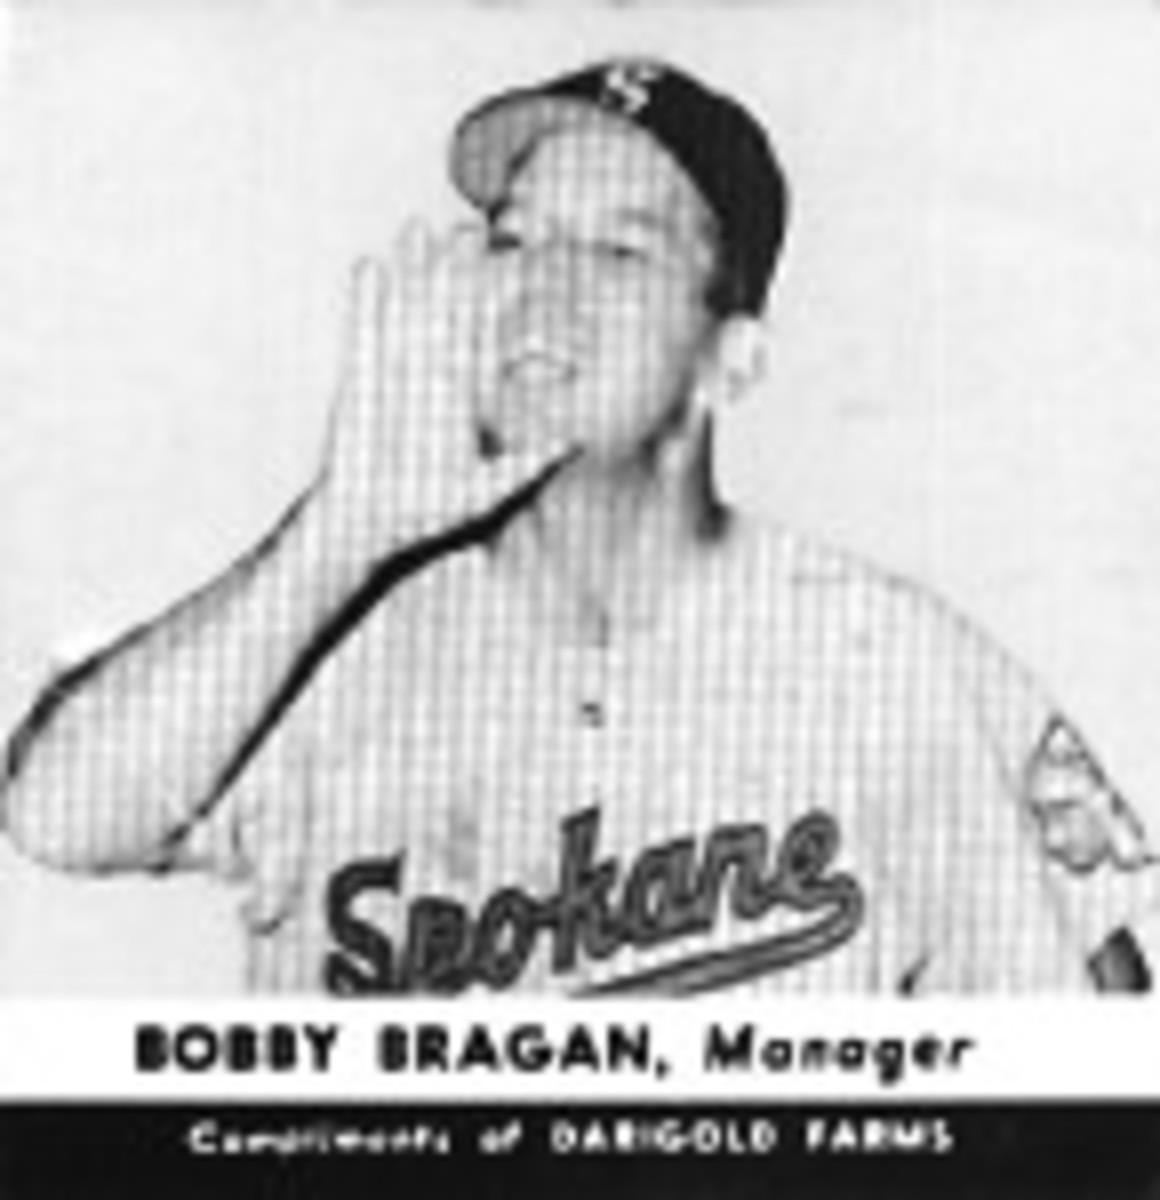 bobby bragan managerbw.jpg